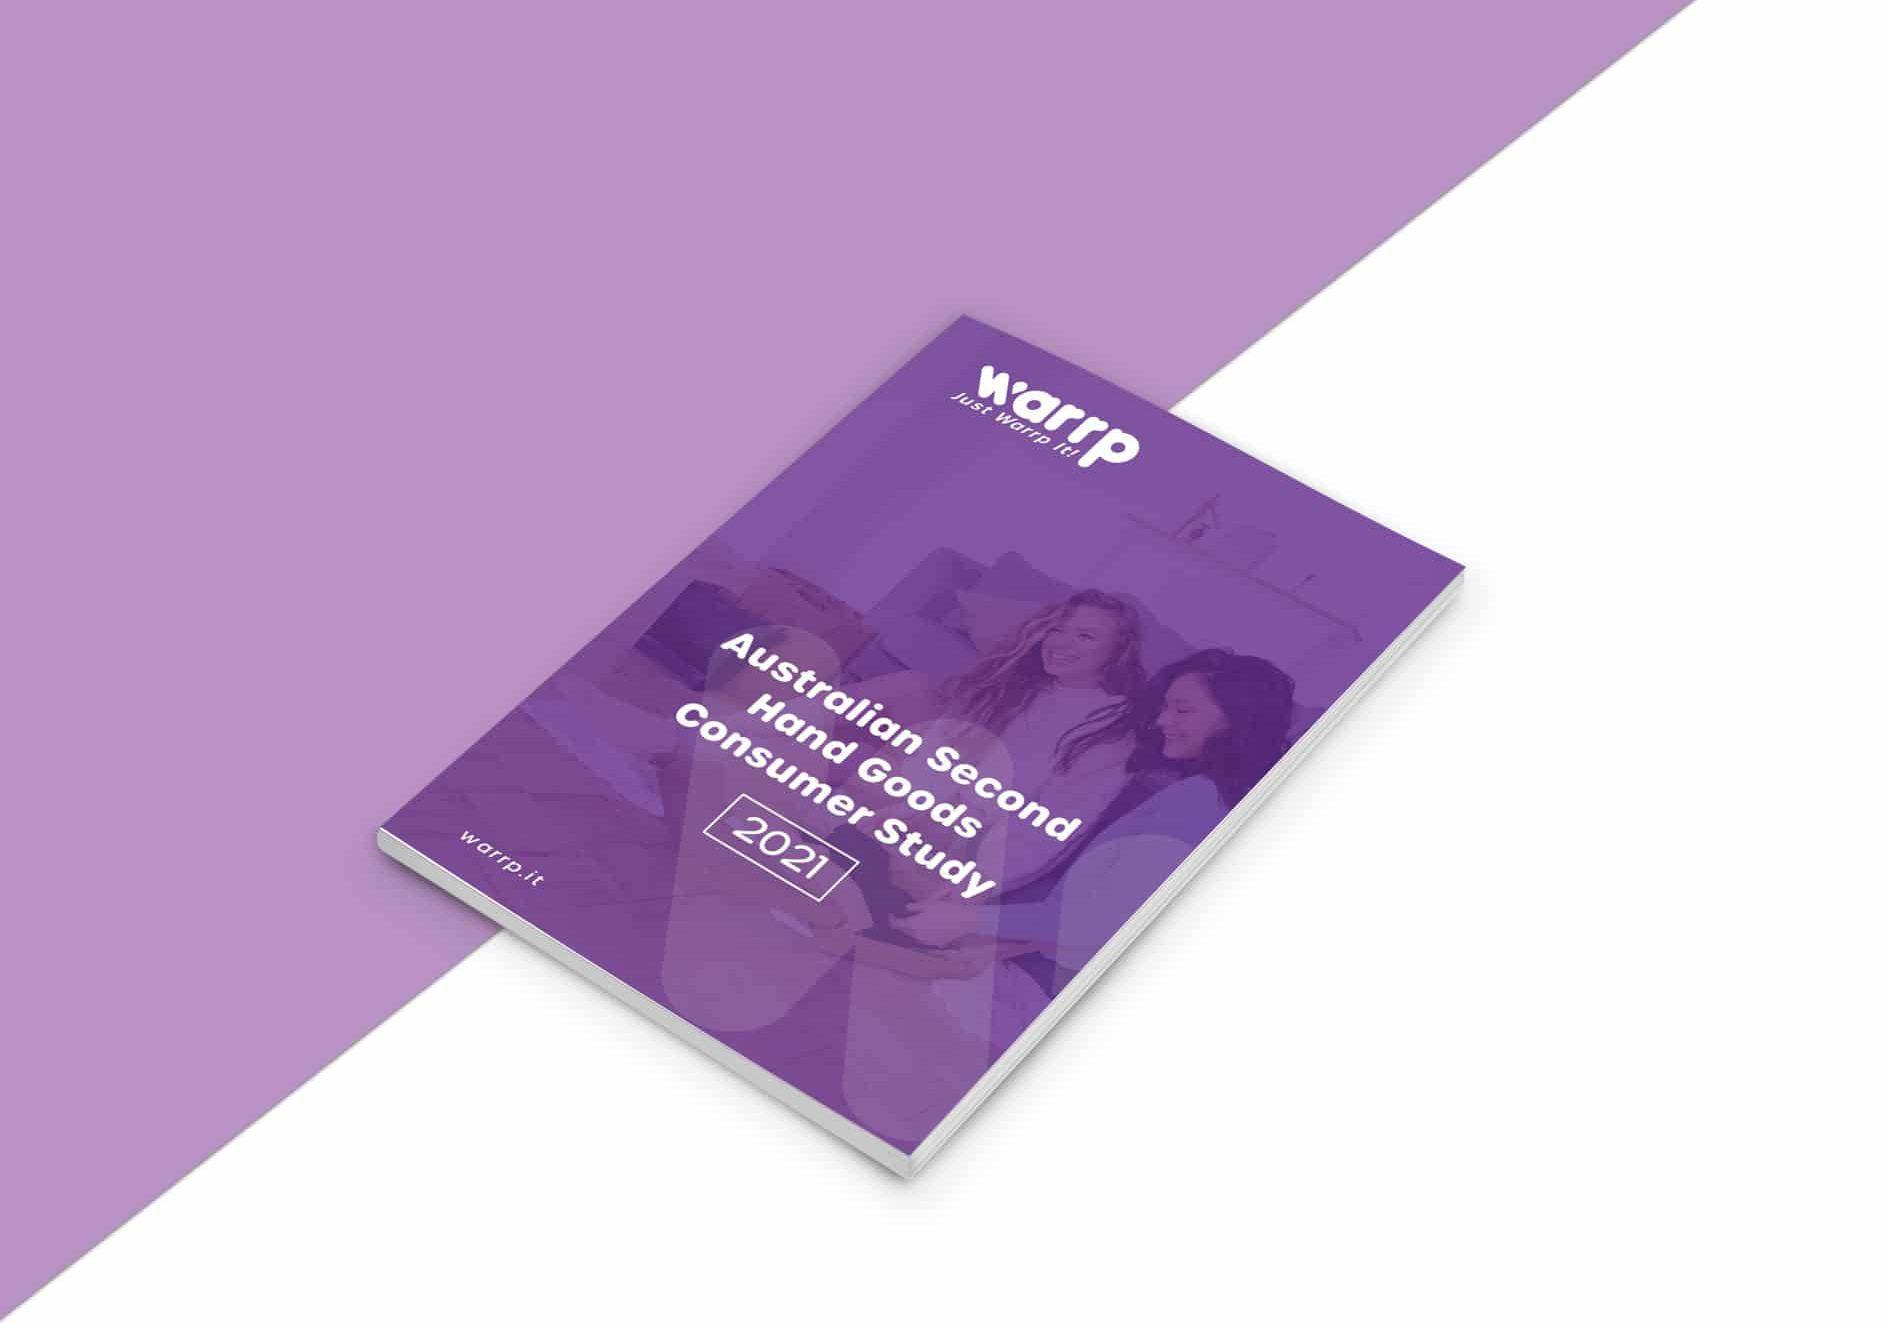 Australian-Second-Hand-Goods-Consumer-Study-2021-Stack